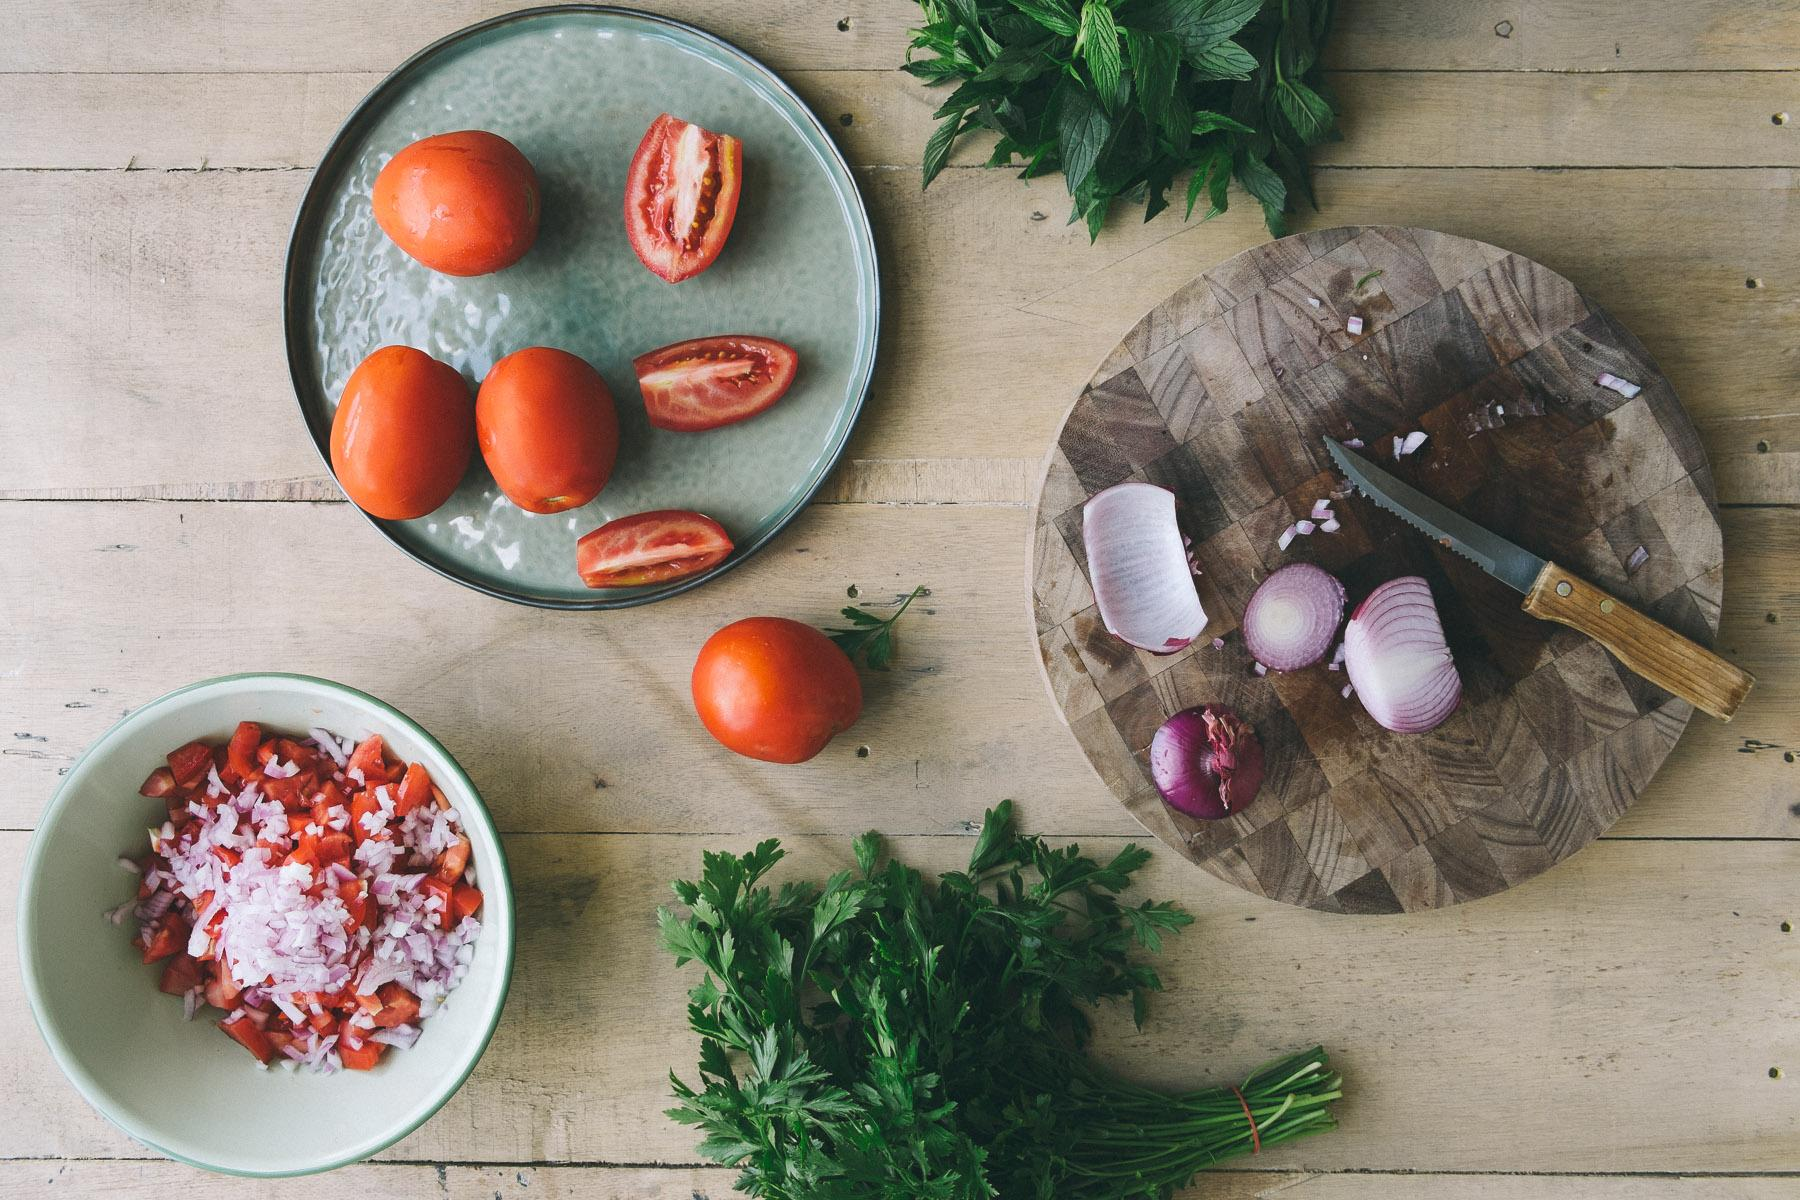 preparing tomato fritters